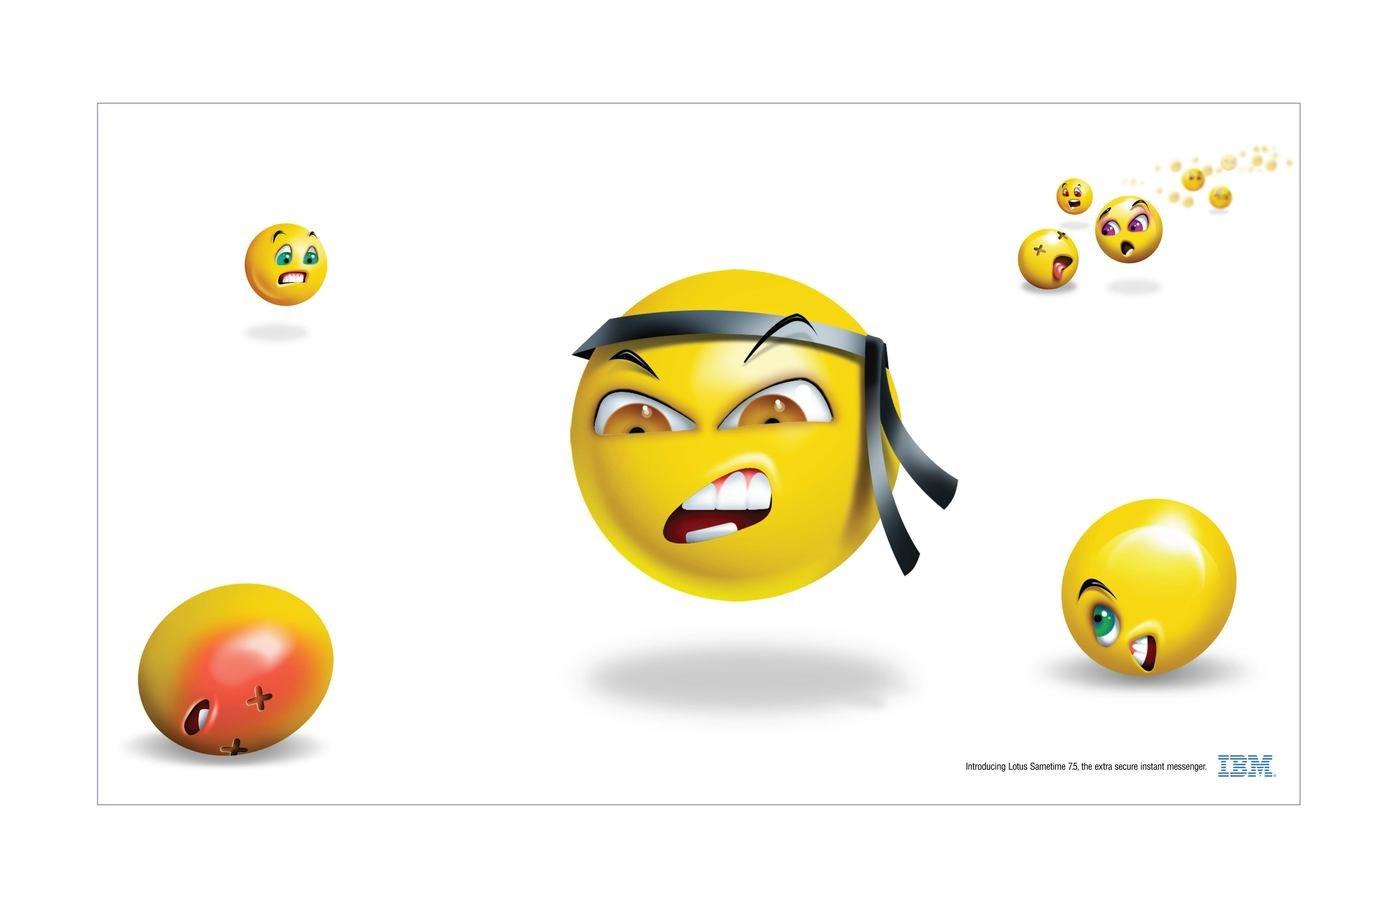 sametime emoticons gif